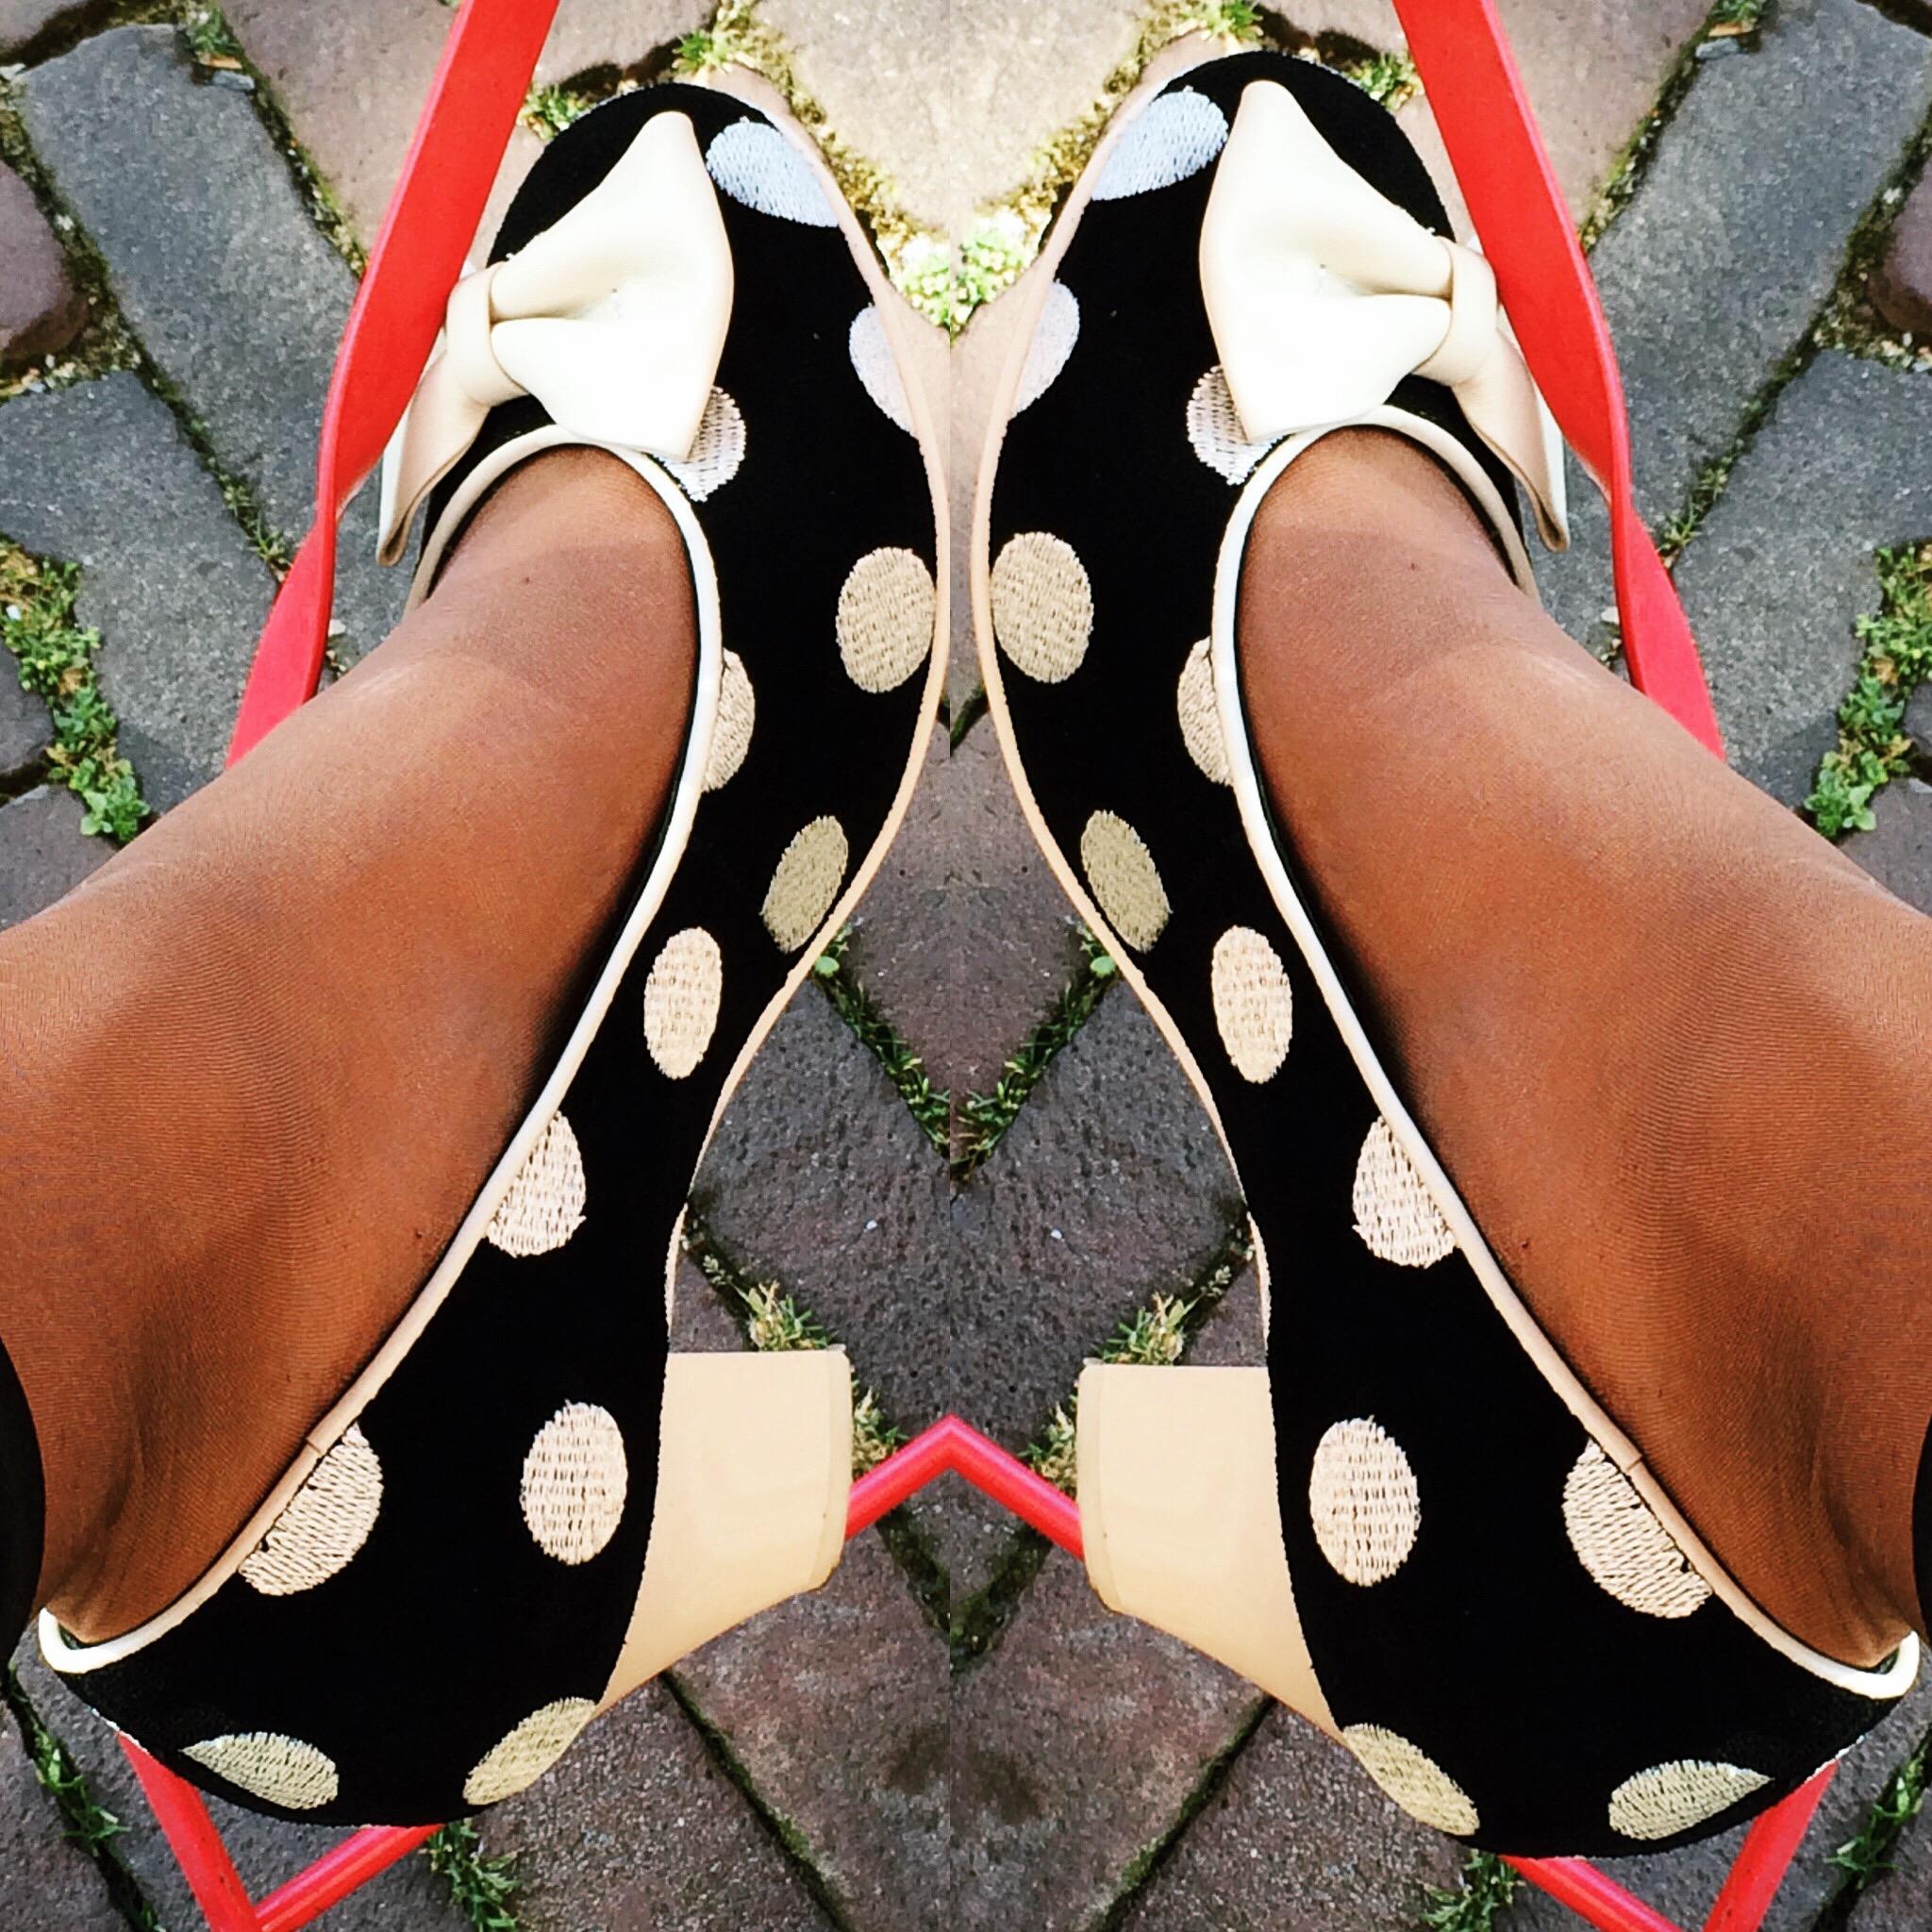 Lola Ramona polkadot heels